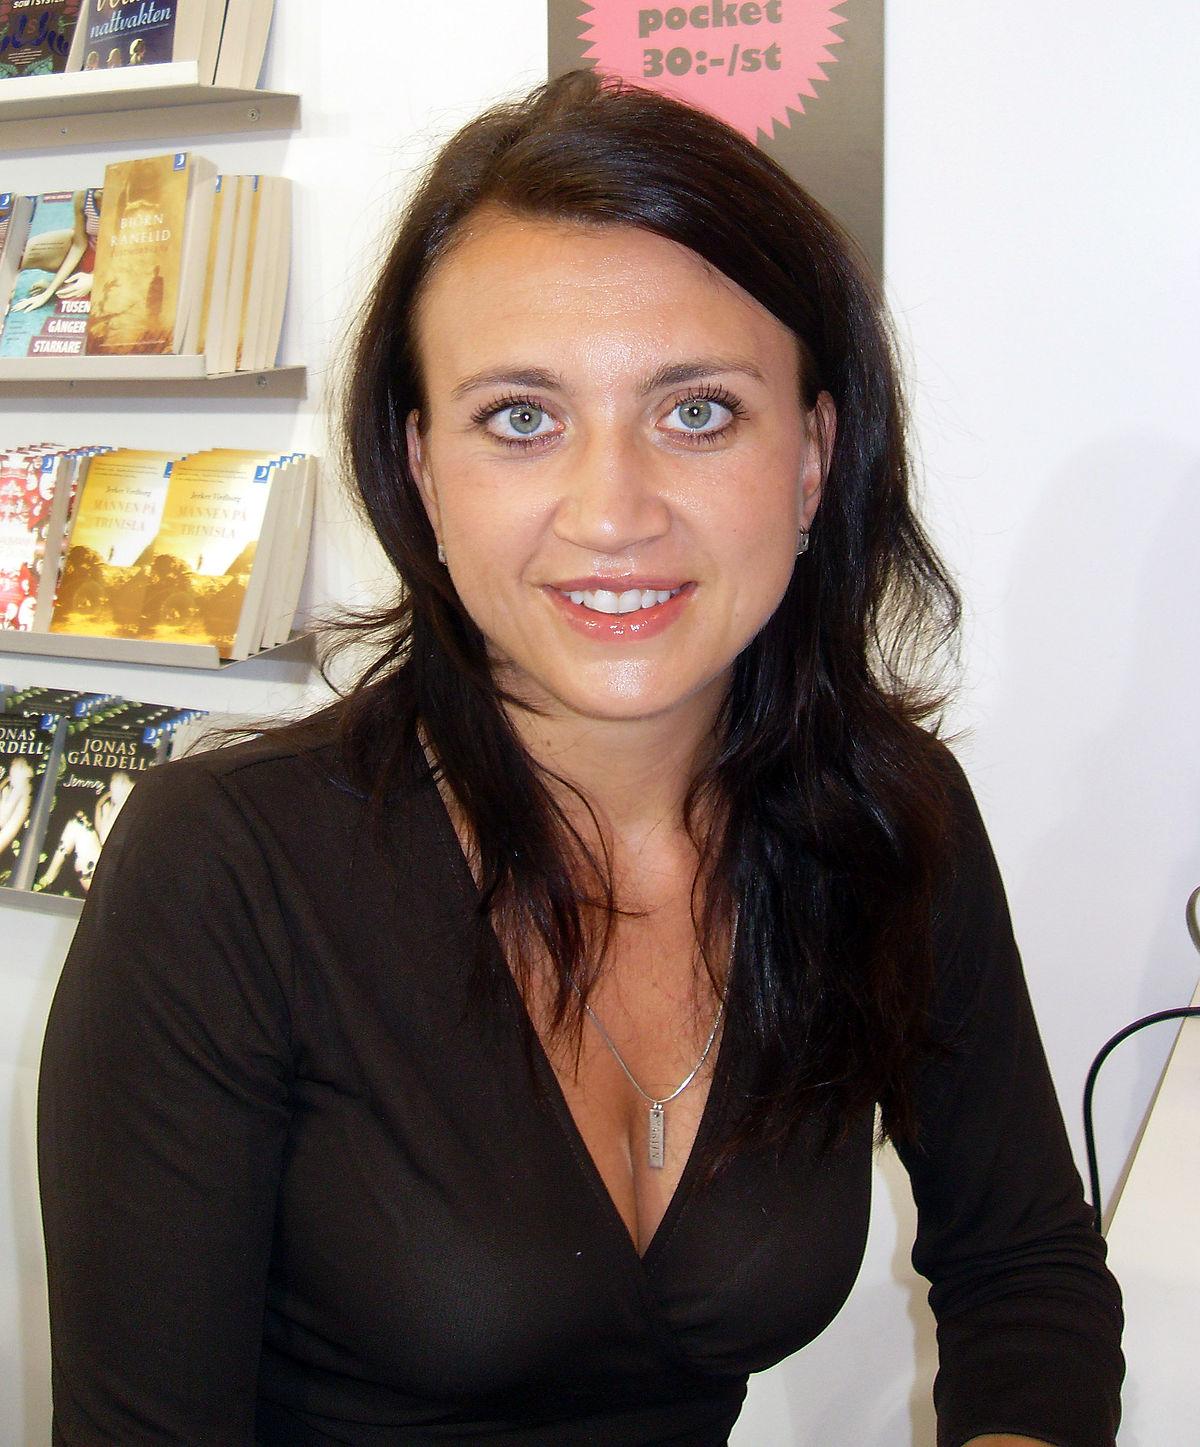 escritora-camilla-Läckberg